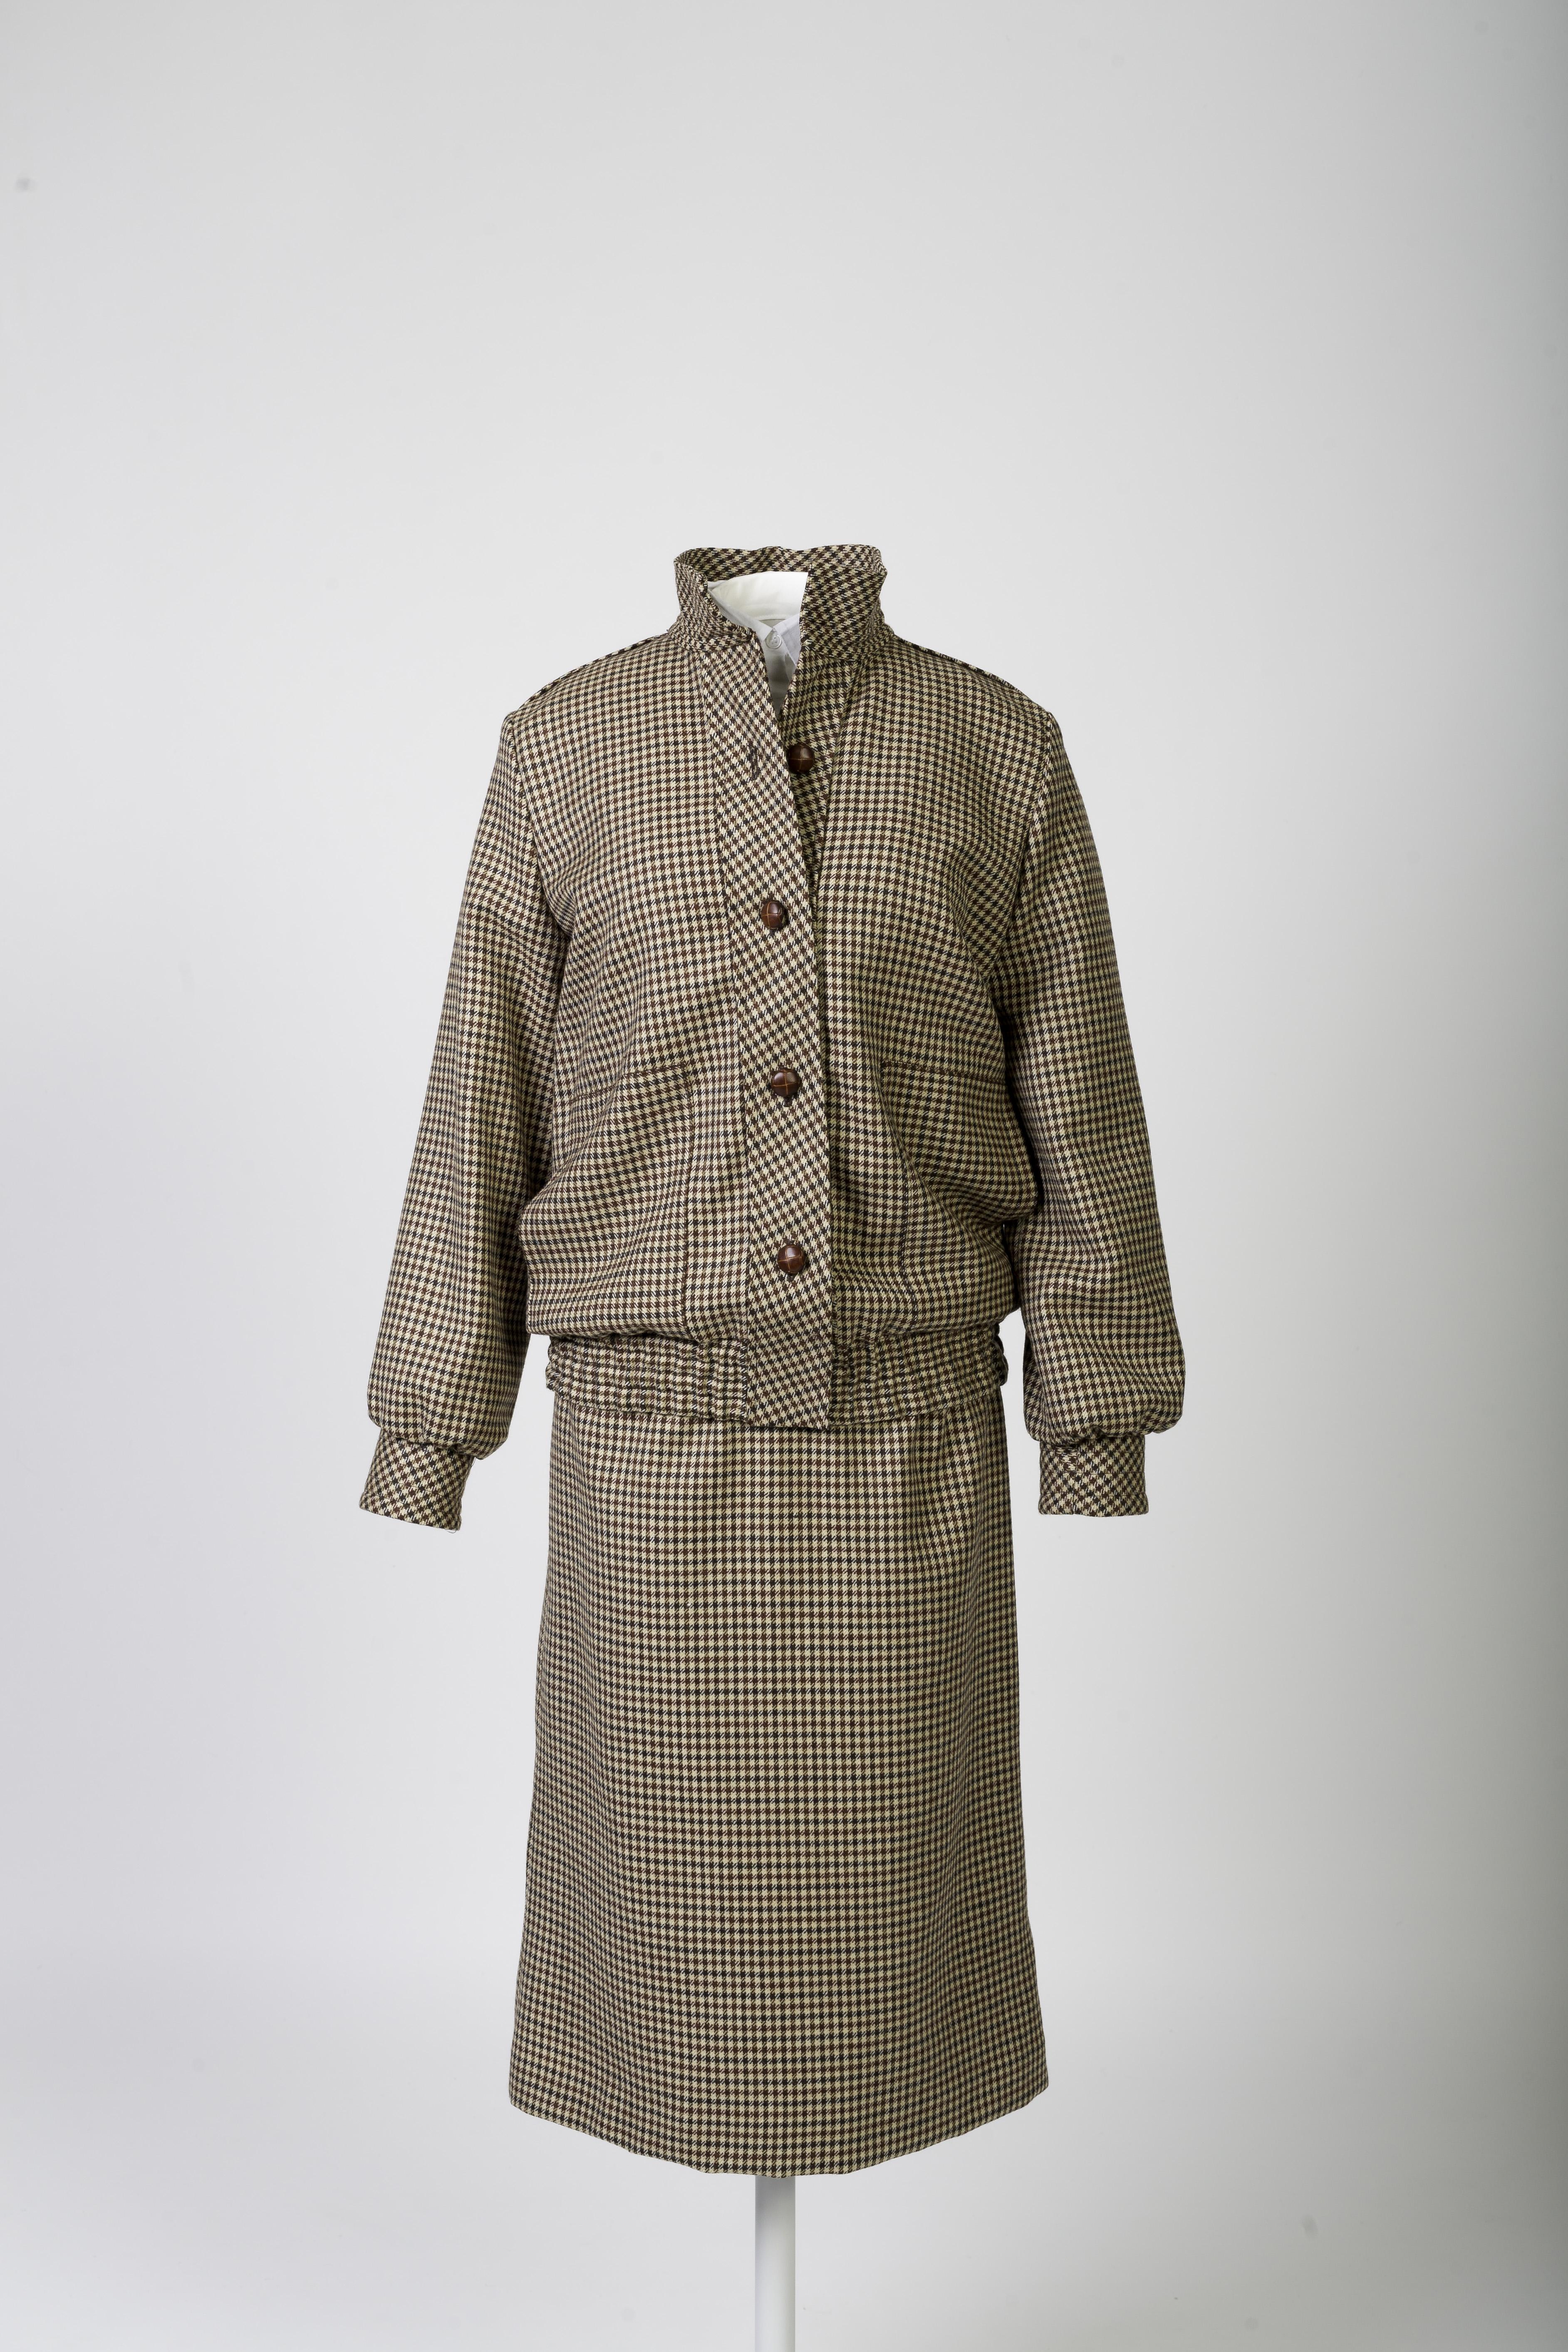 Bill Pashley 'honeymoon' brown tweed day suit © Historic Royal Palaces, Richard Lea Hair